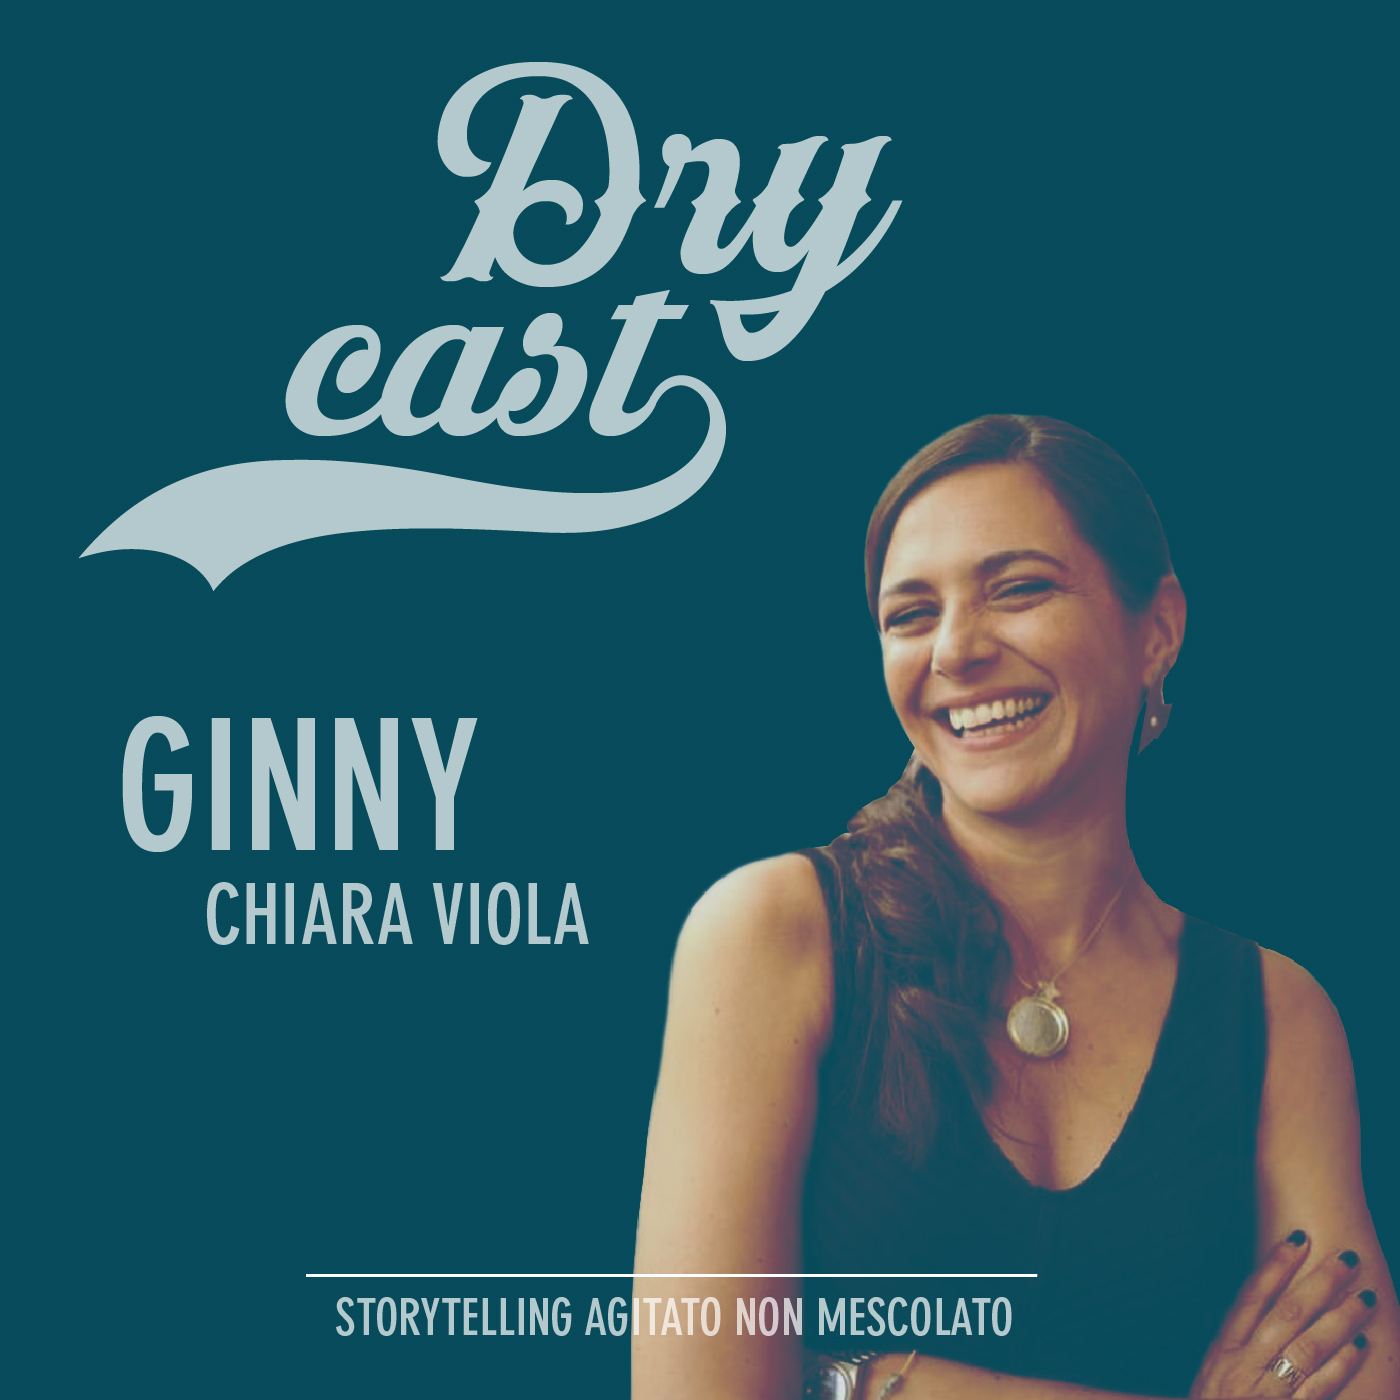 17 - Ginny Chiara Viola